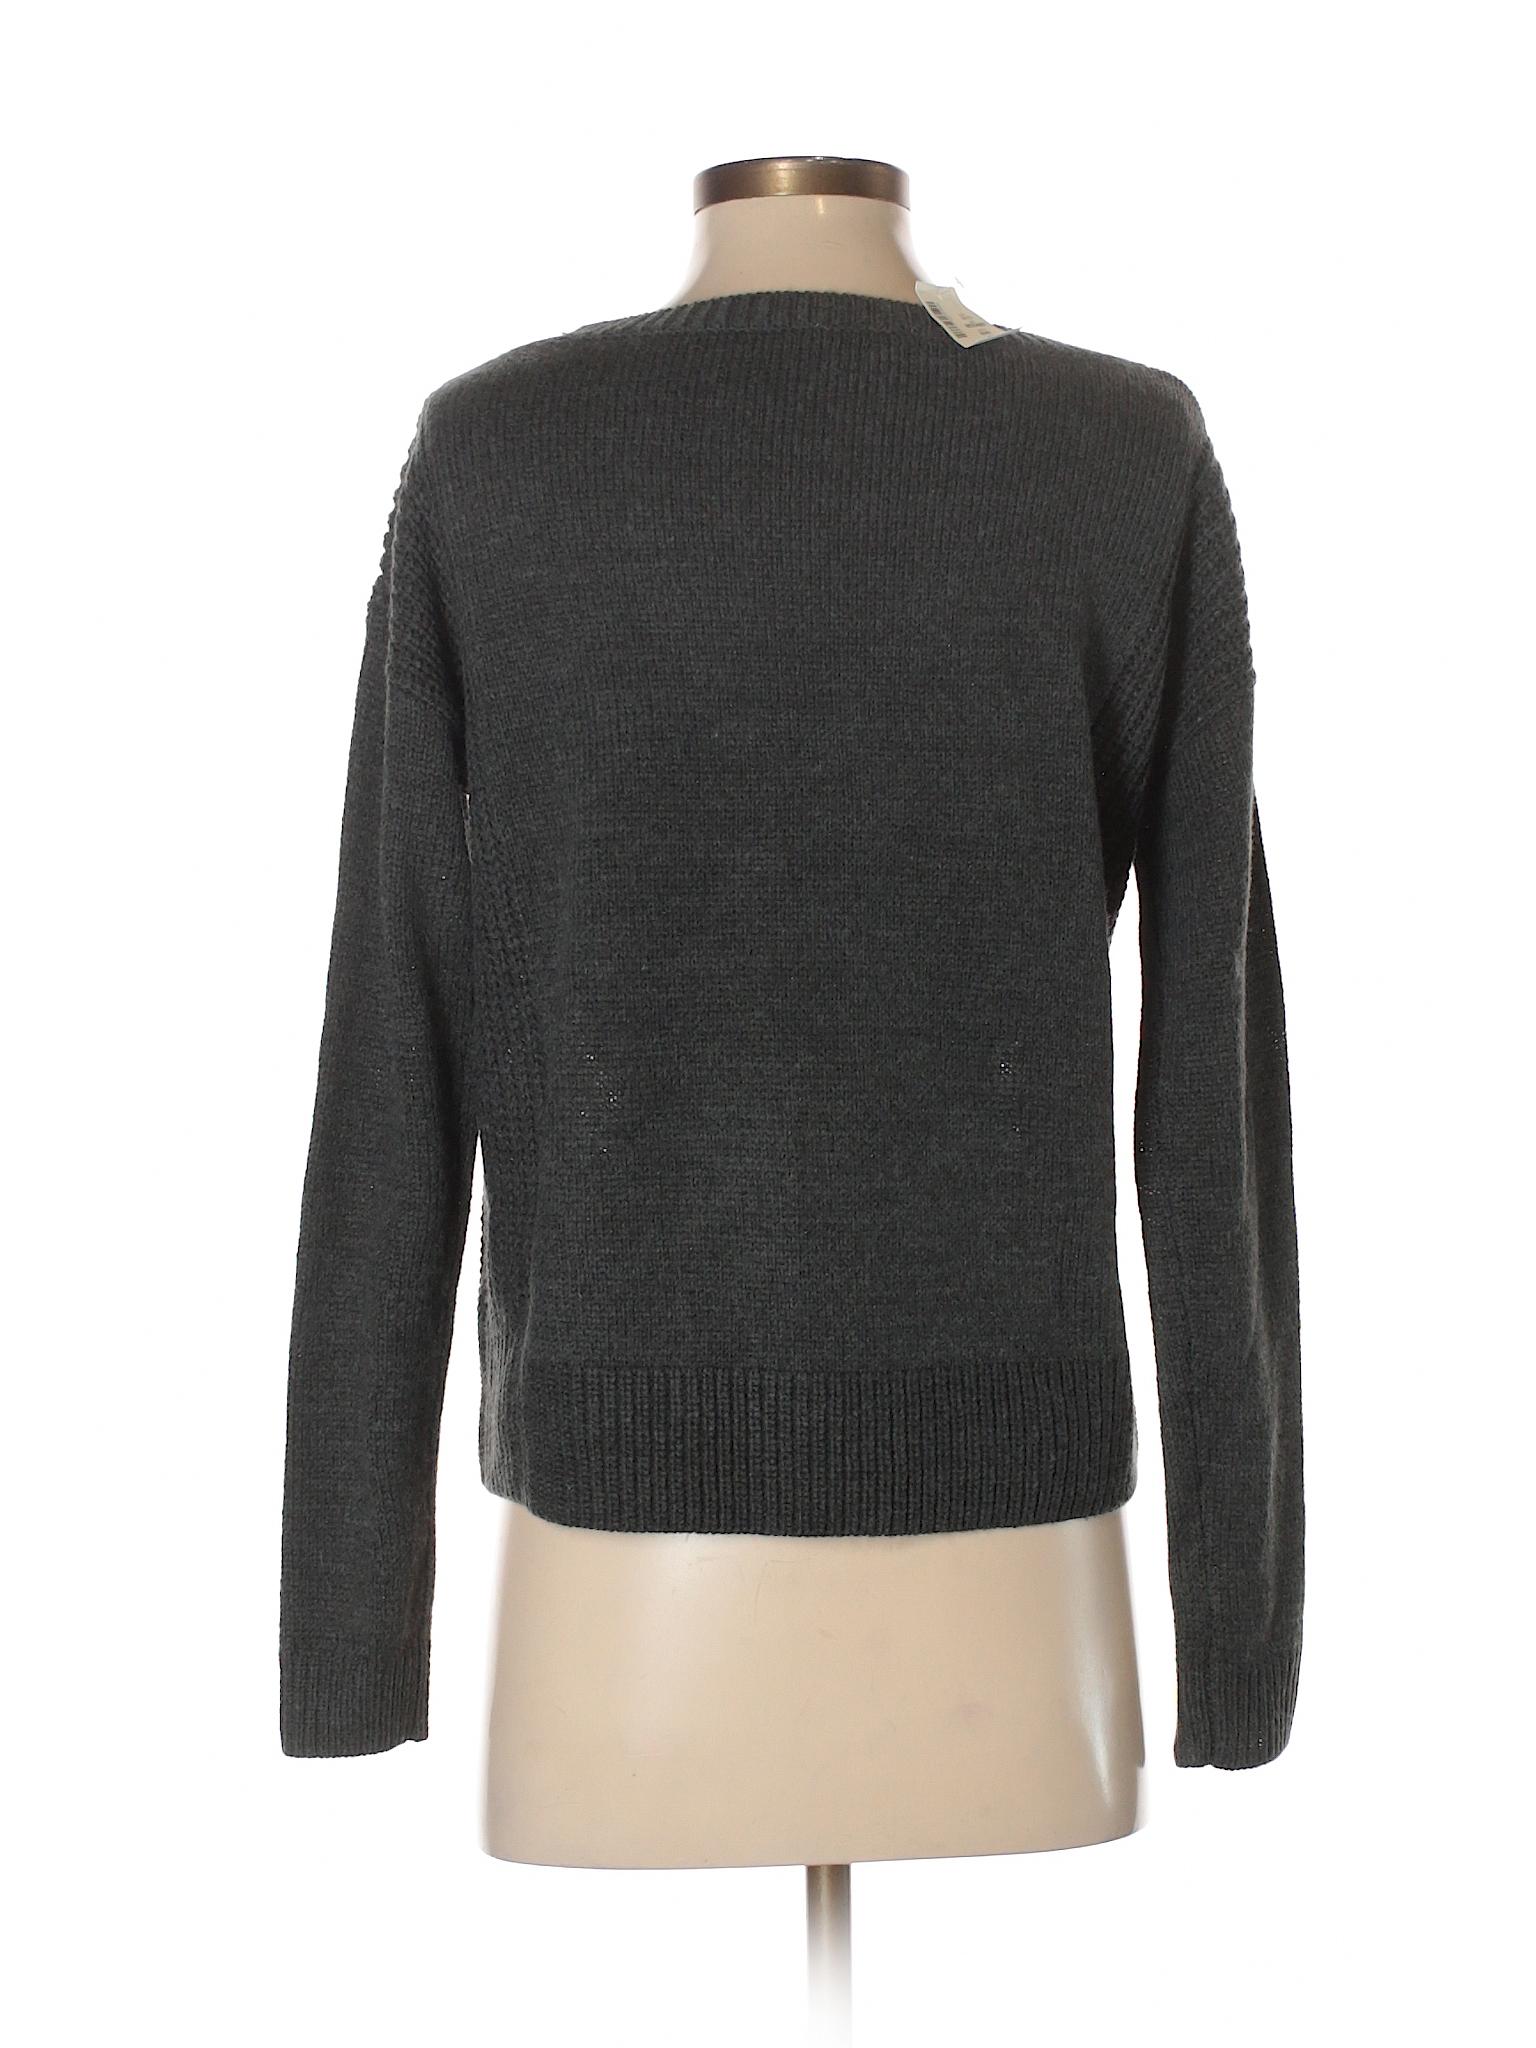 winter Sweater Boutique winter Pullover Aeropostale Pullover Sweater Boutique Aeropostale gx8rXvxqw